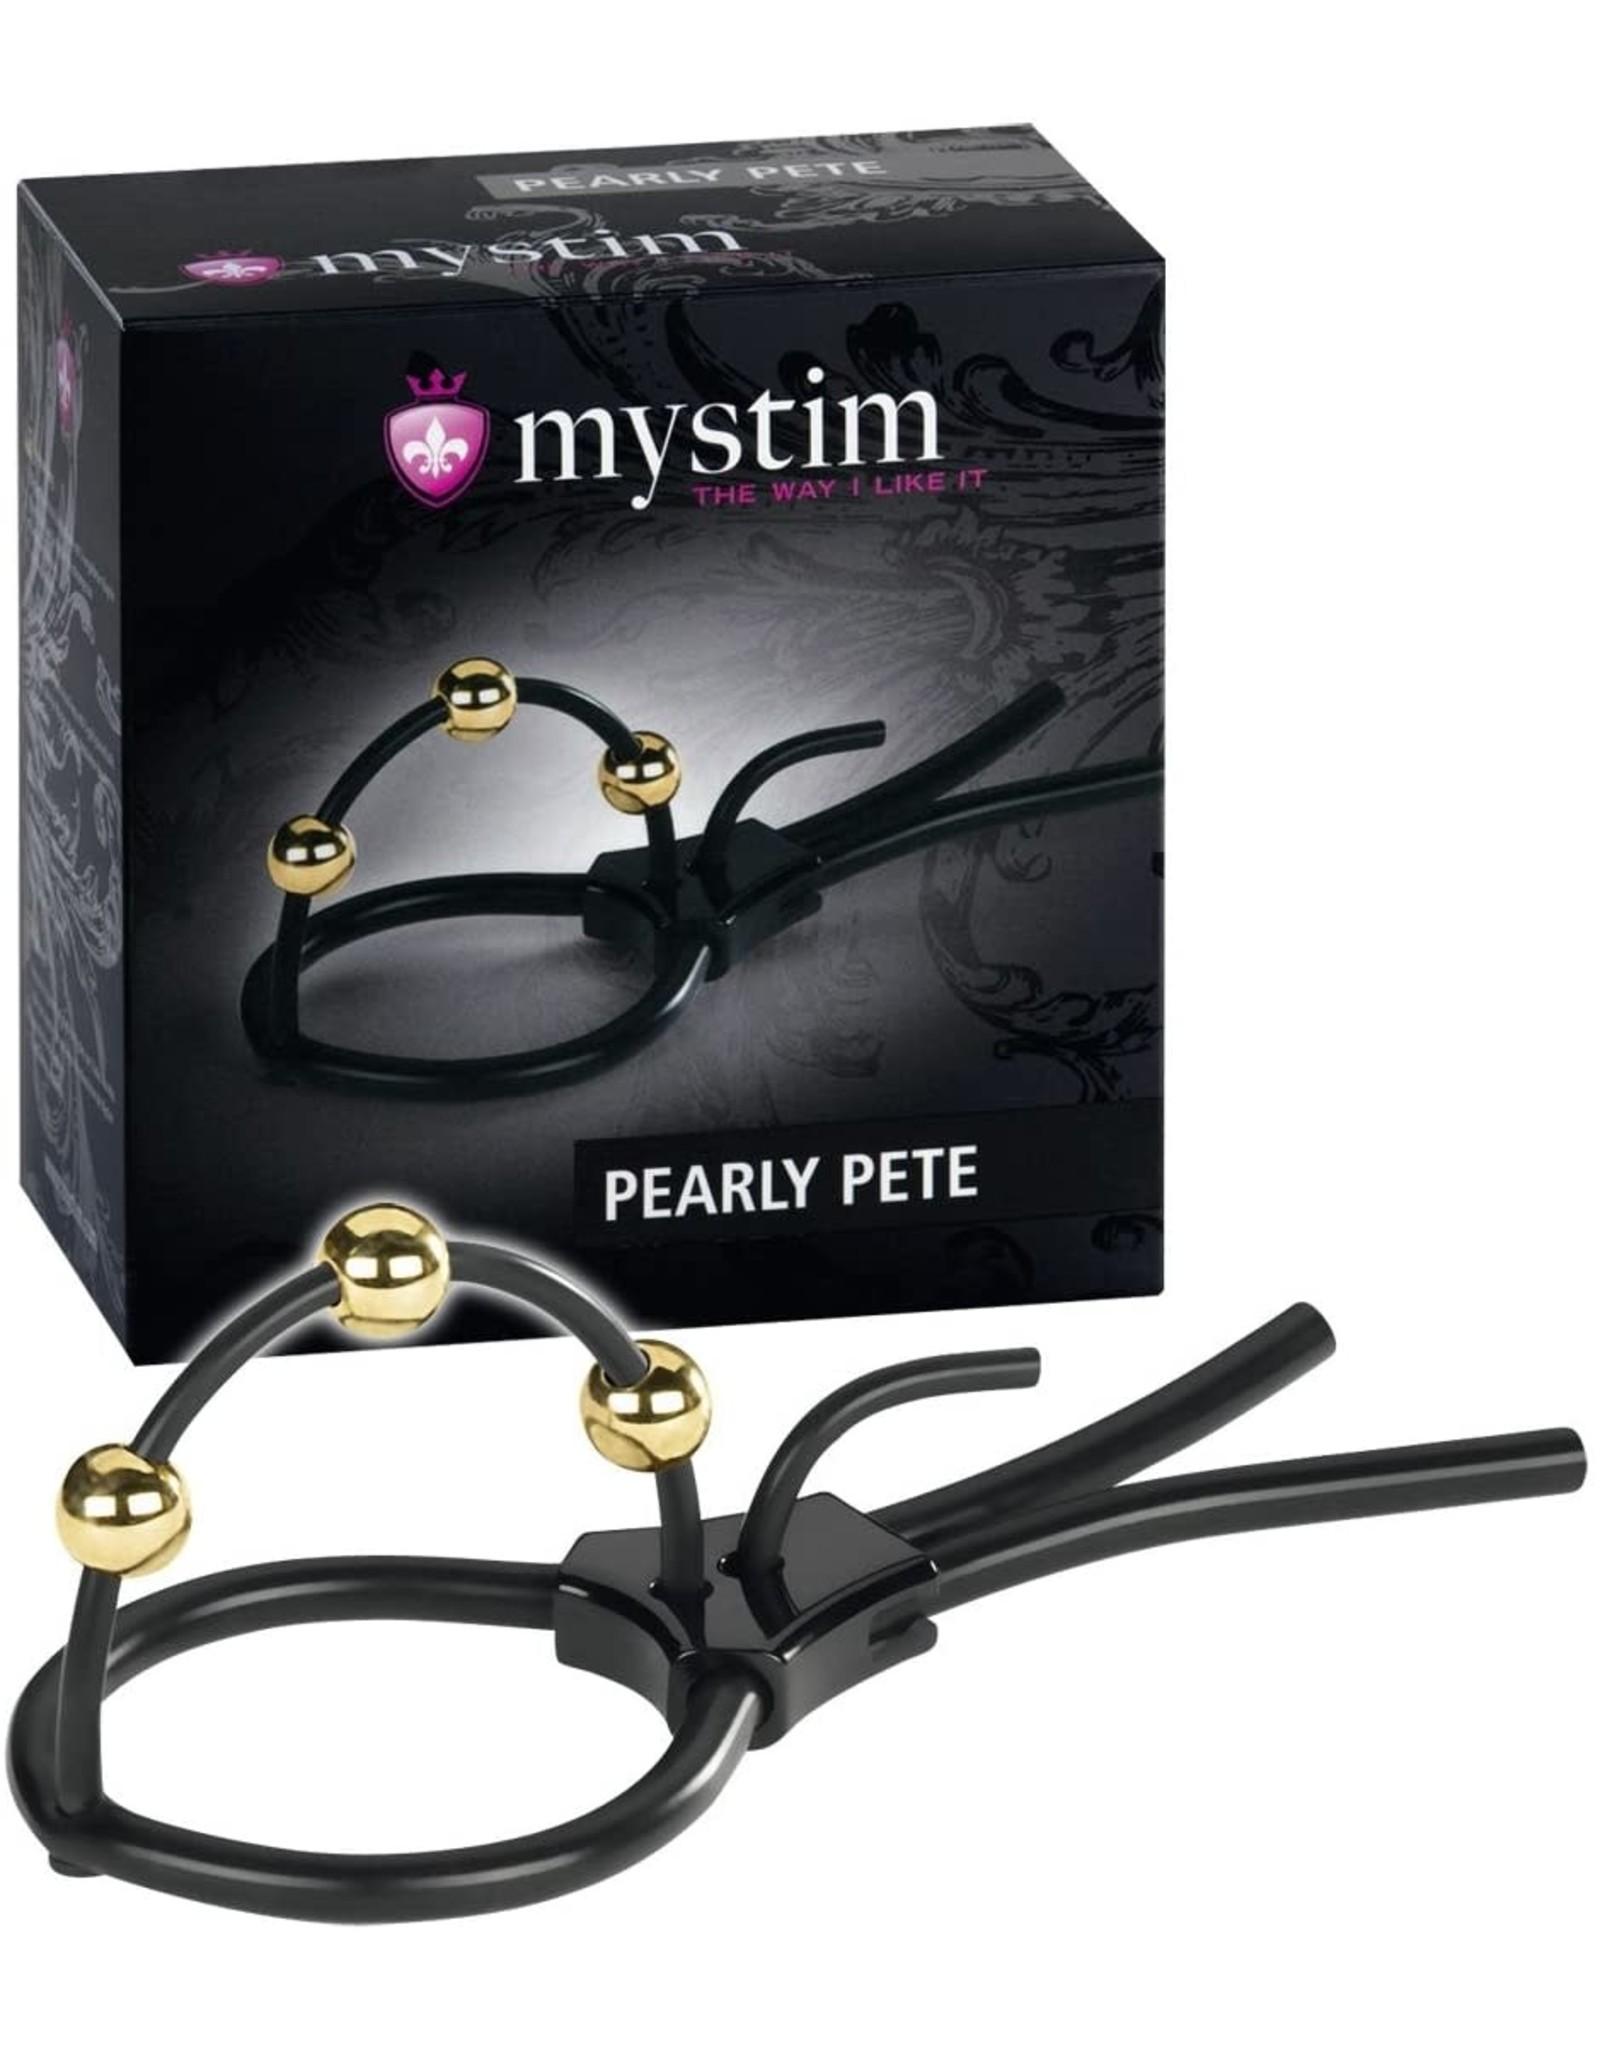 MyStim MyStim Pearly Pete Corona Strap